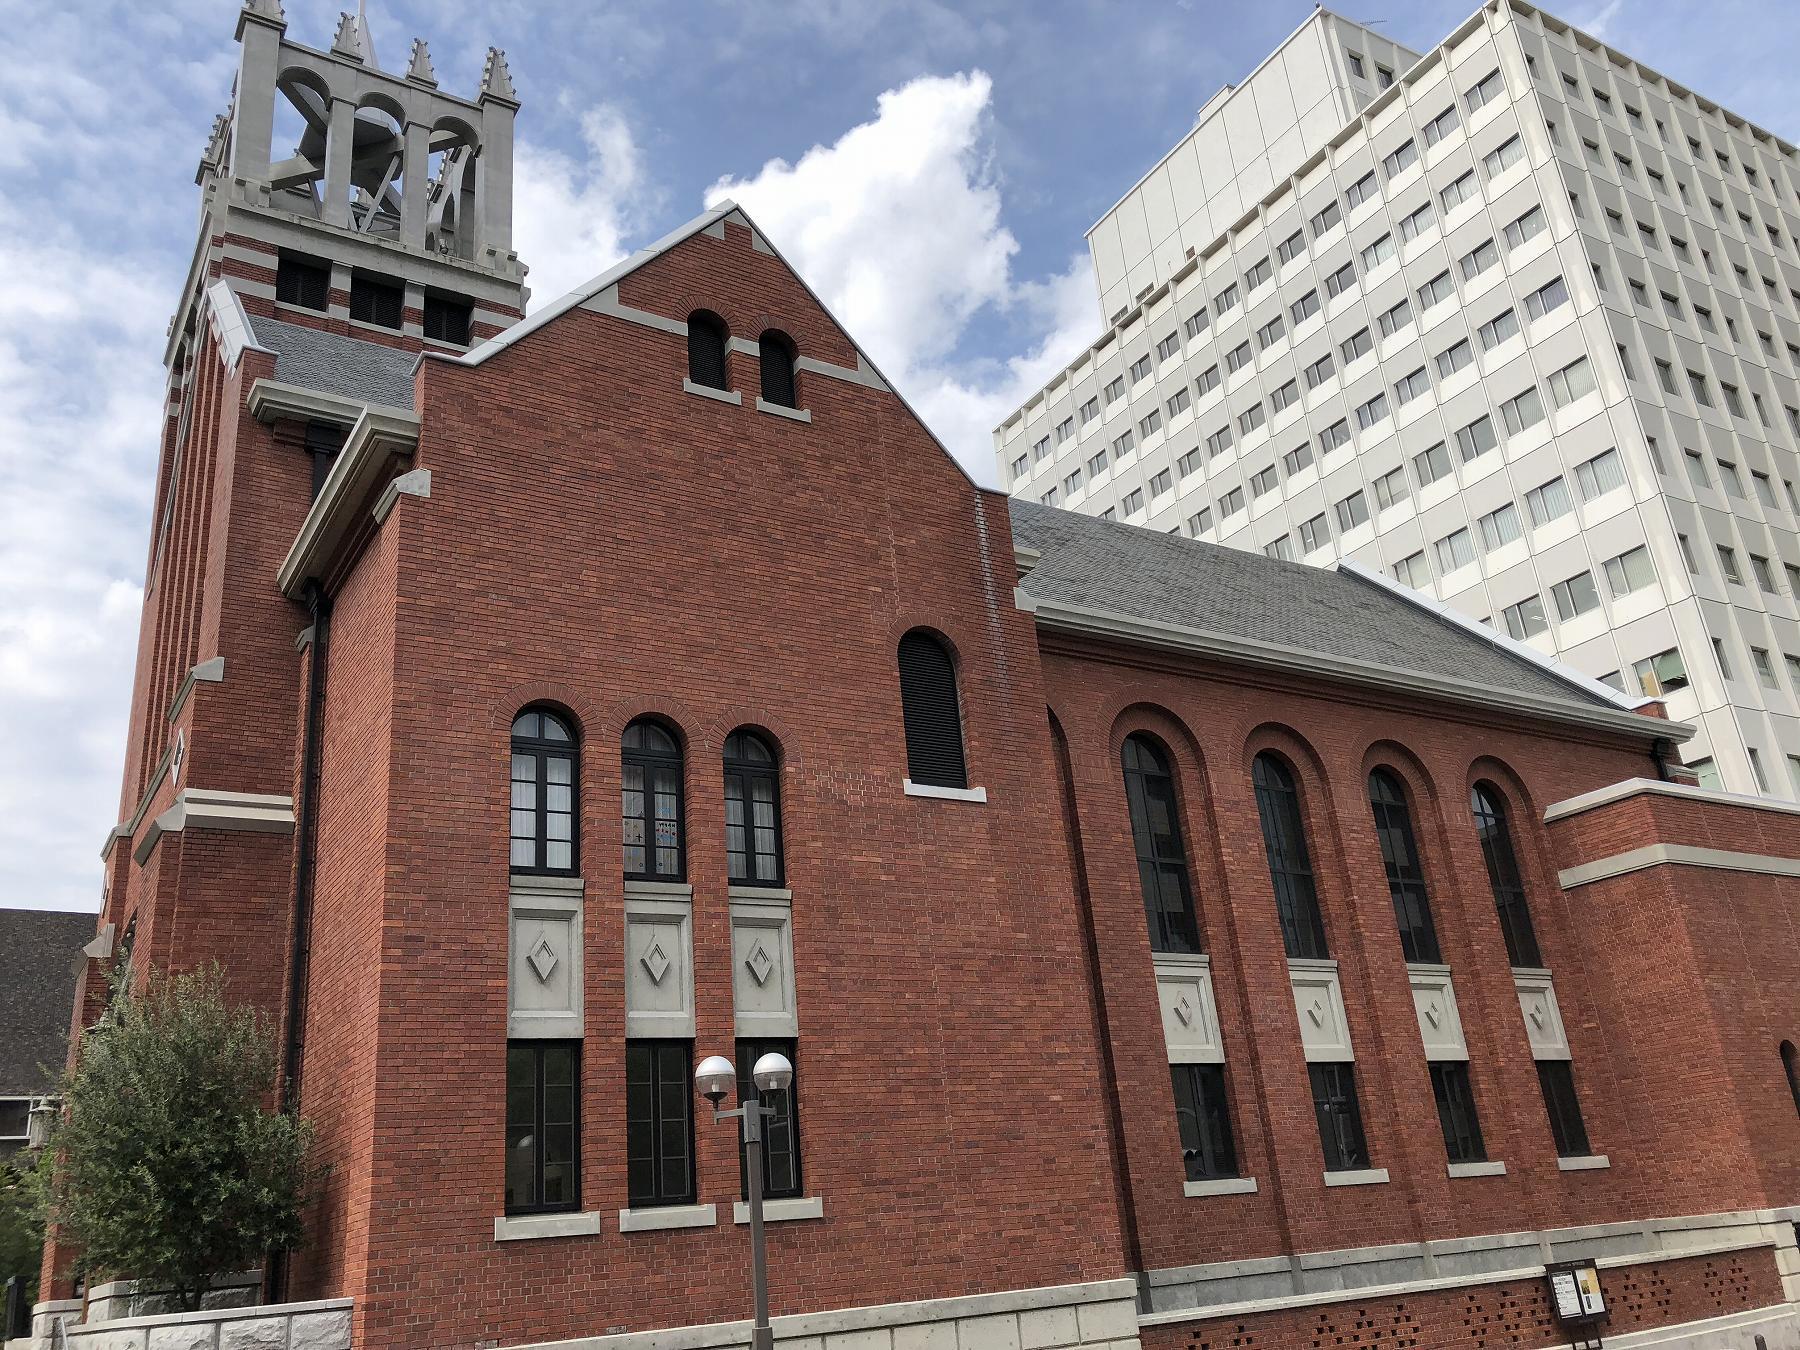 美しい近代建築の建物をご紹介「神戸栄光教会」&「神戸朝日ビル」 #近代建築 #産業遺産 #神戸観光 #渡邊節